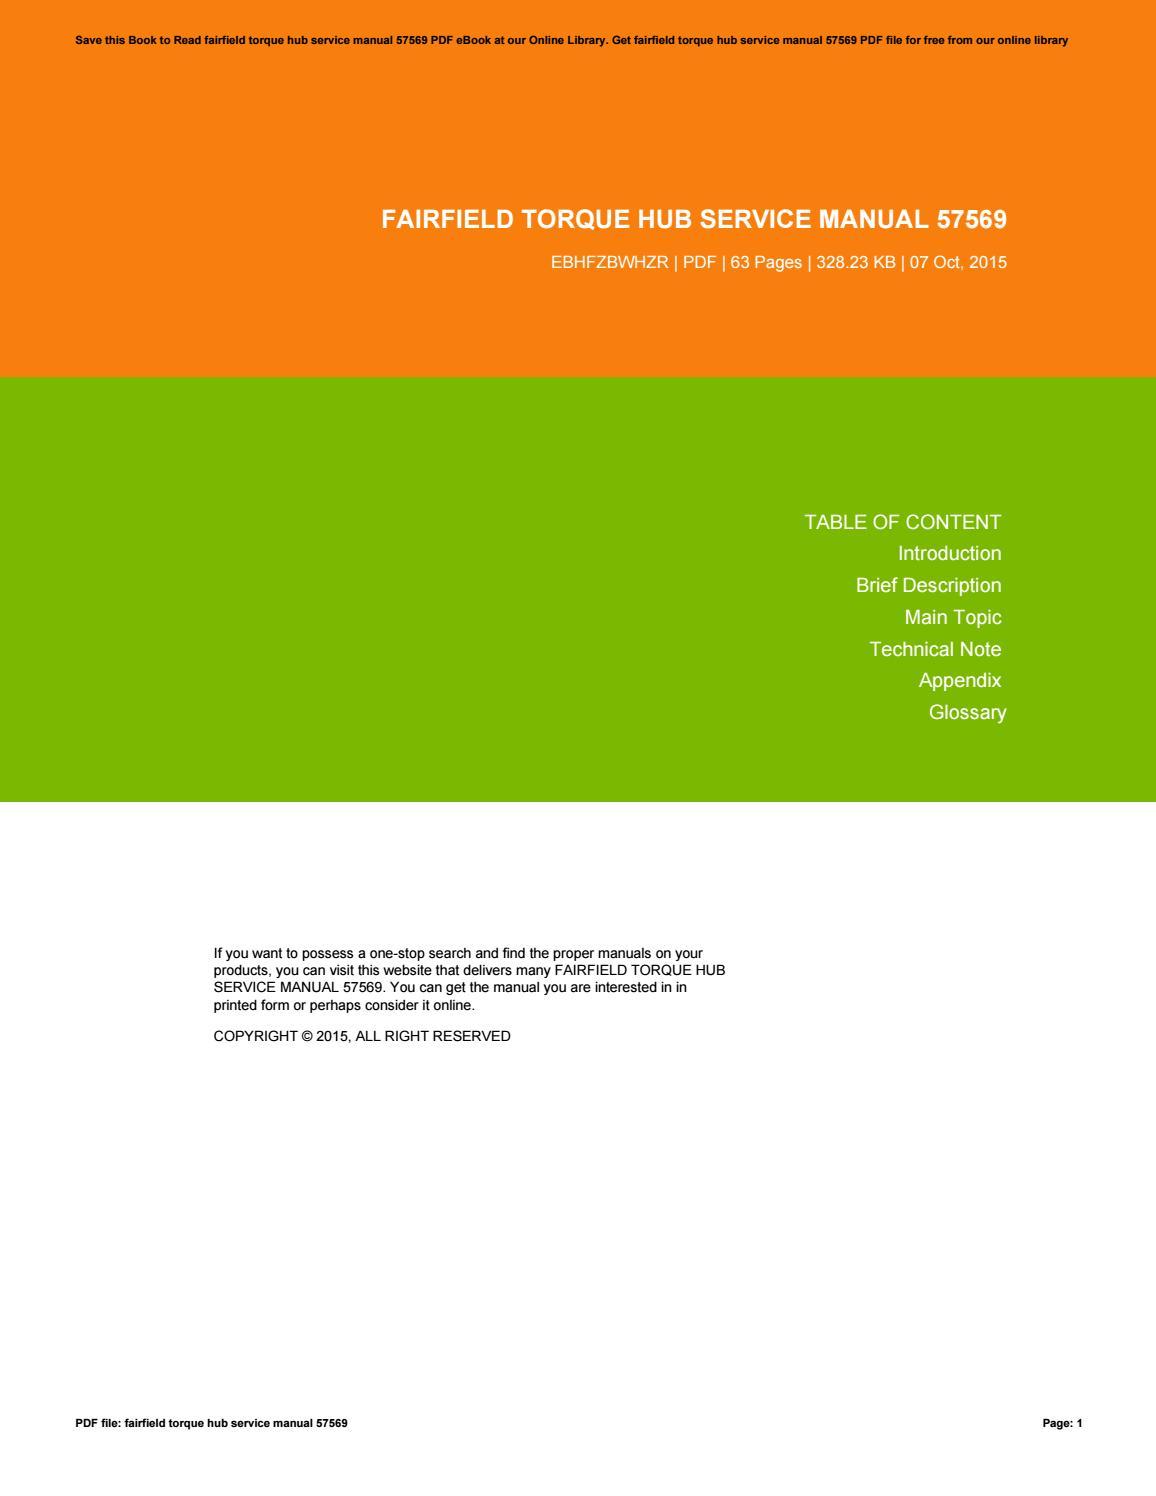 fairfield torque hub service manual 57569 by ugimail854 issuu rh issuu com